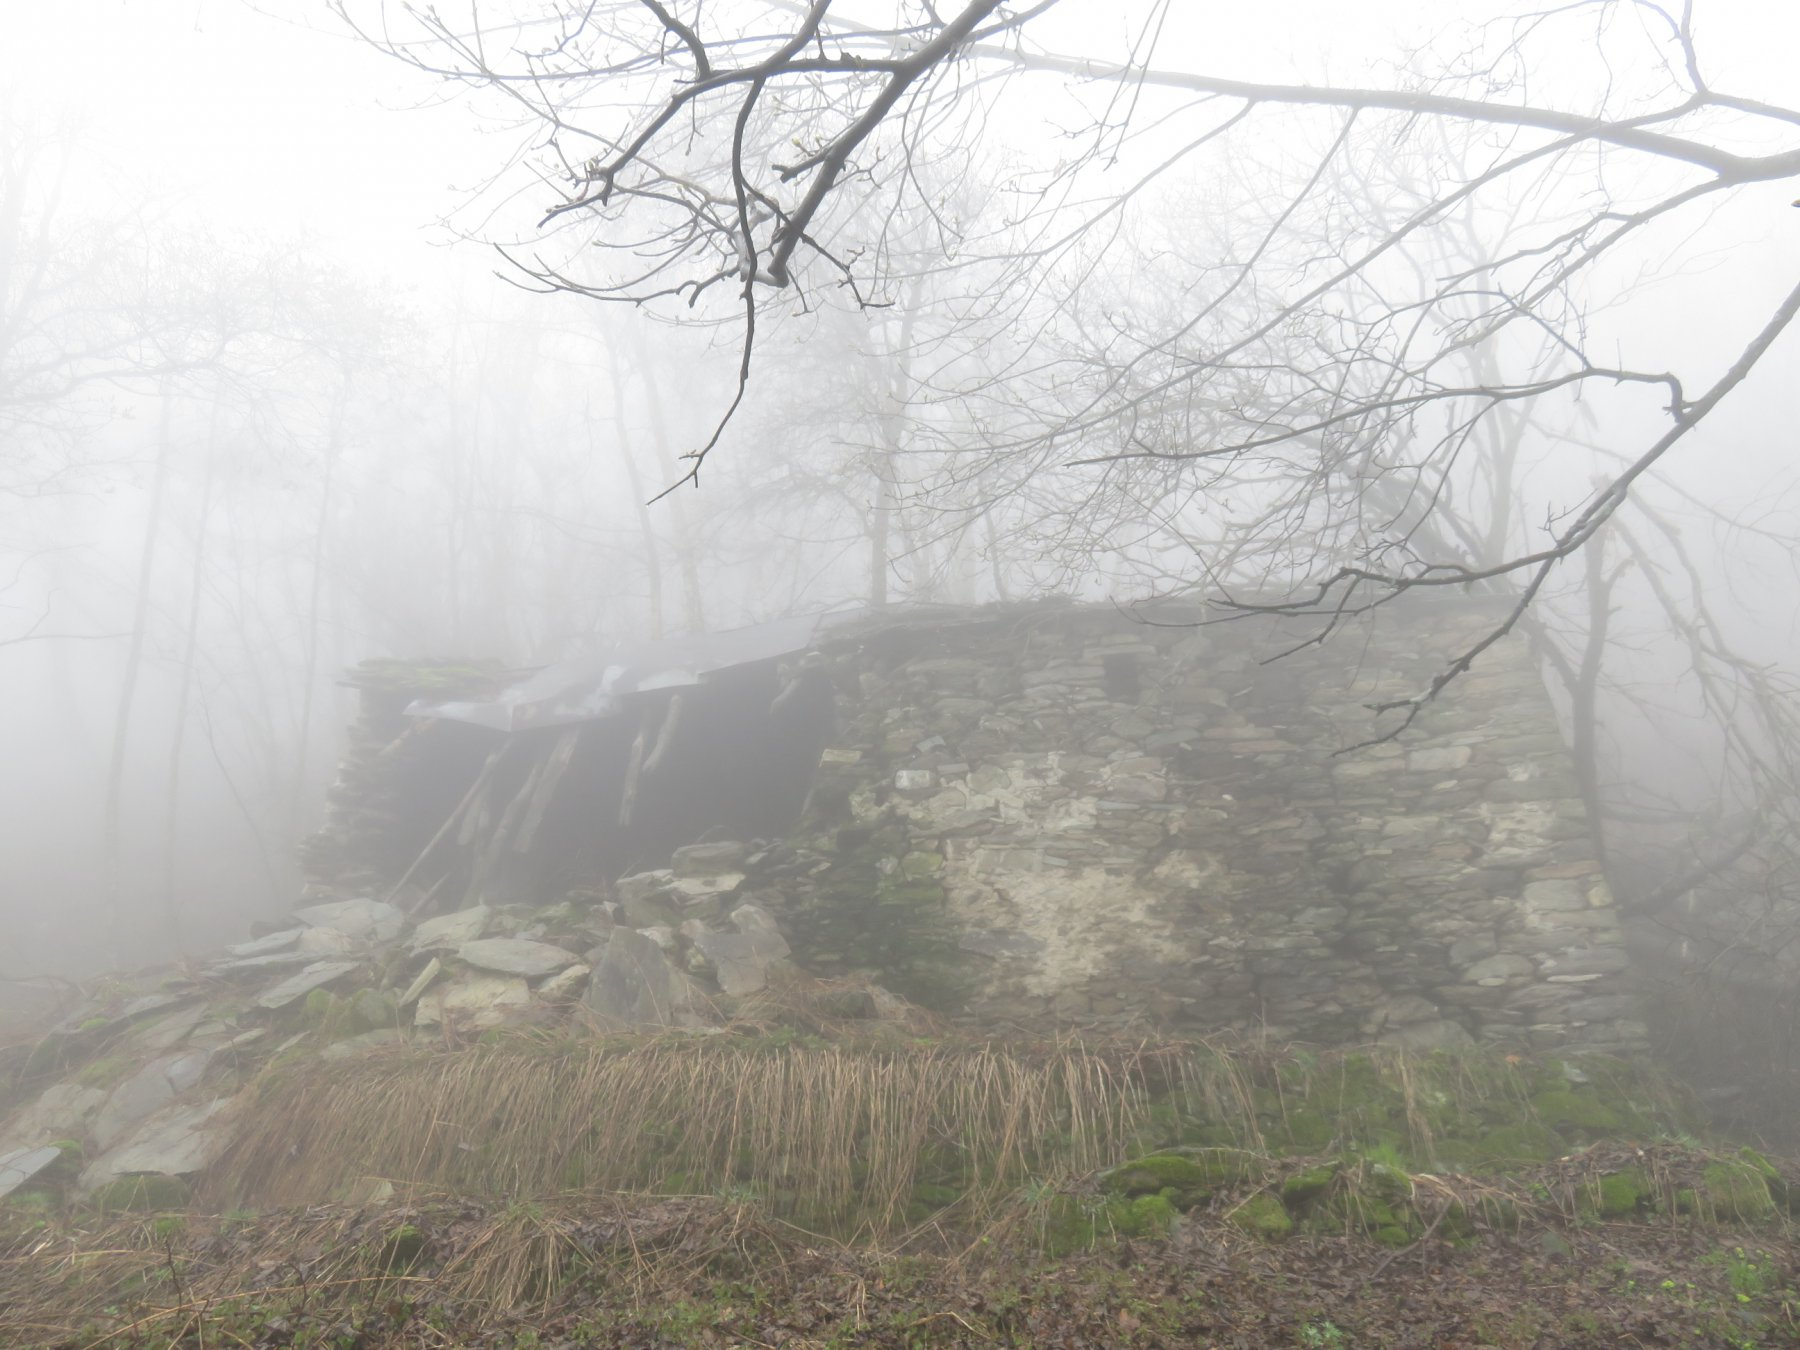 Alpe Crest in completa rovina